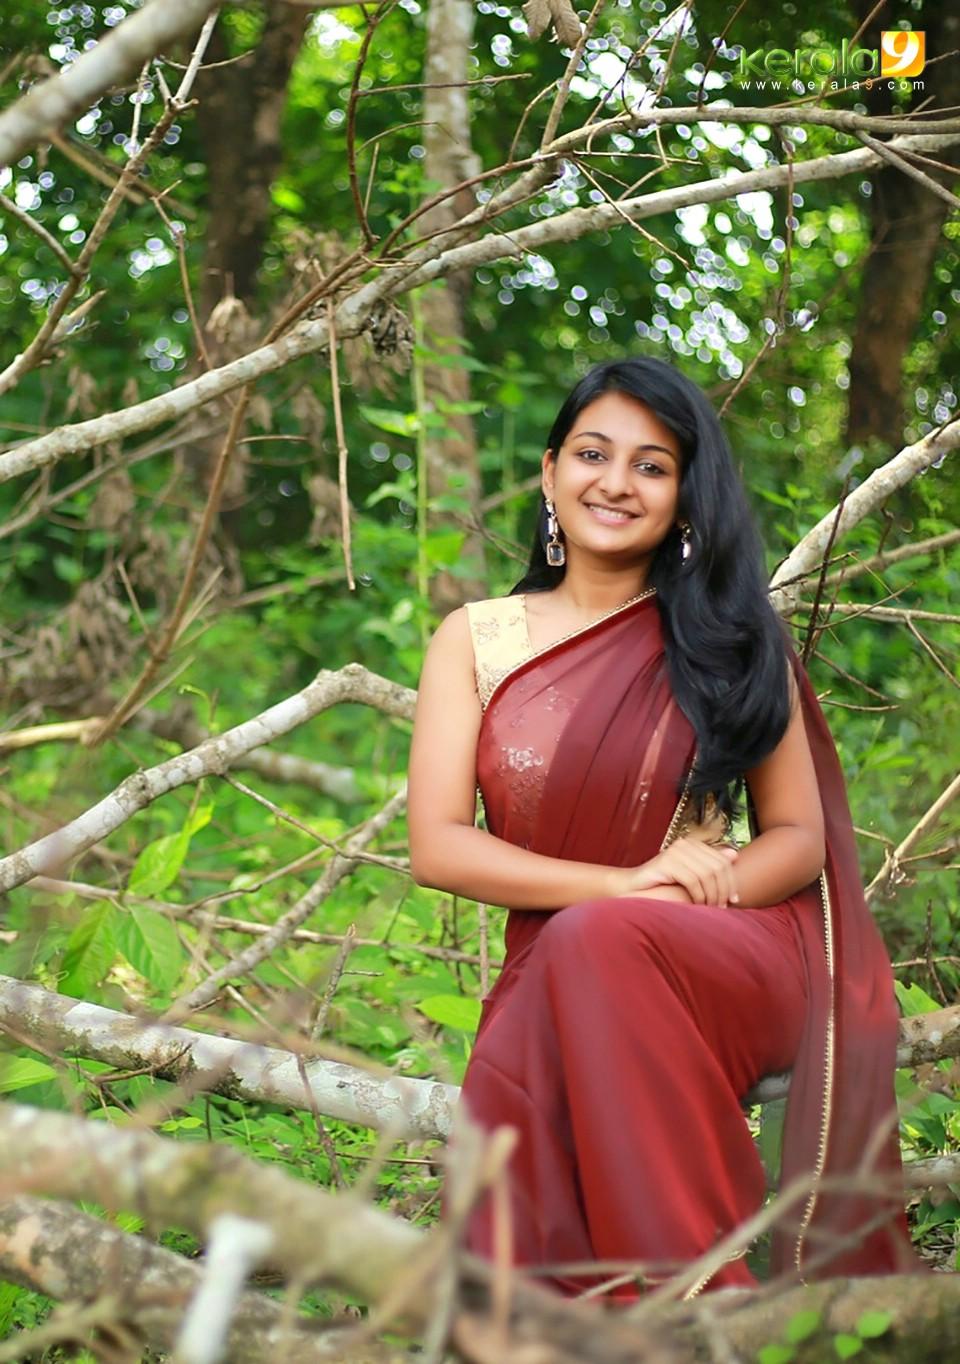 esther-anil-in-saree-latest-photos-317